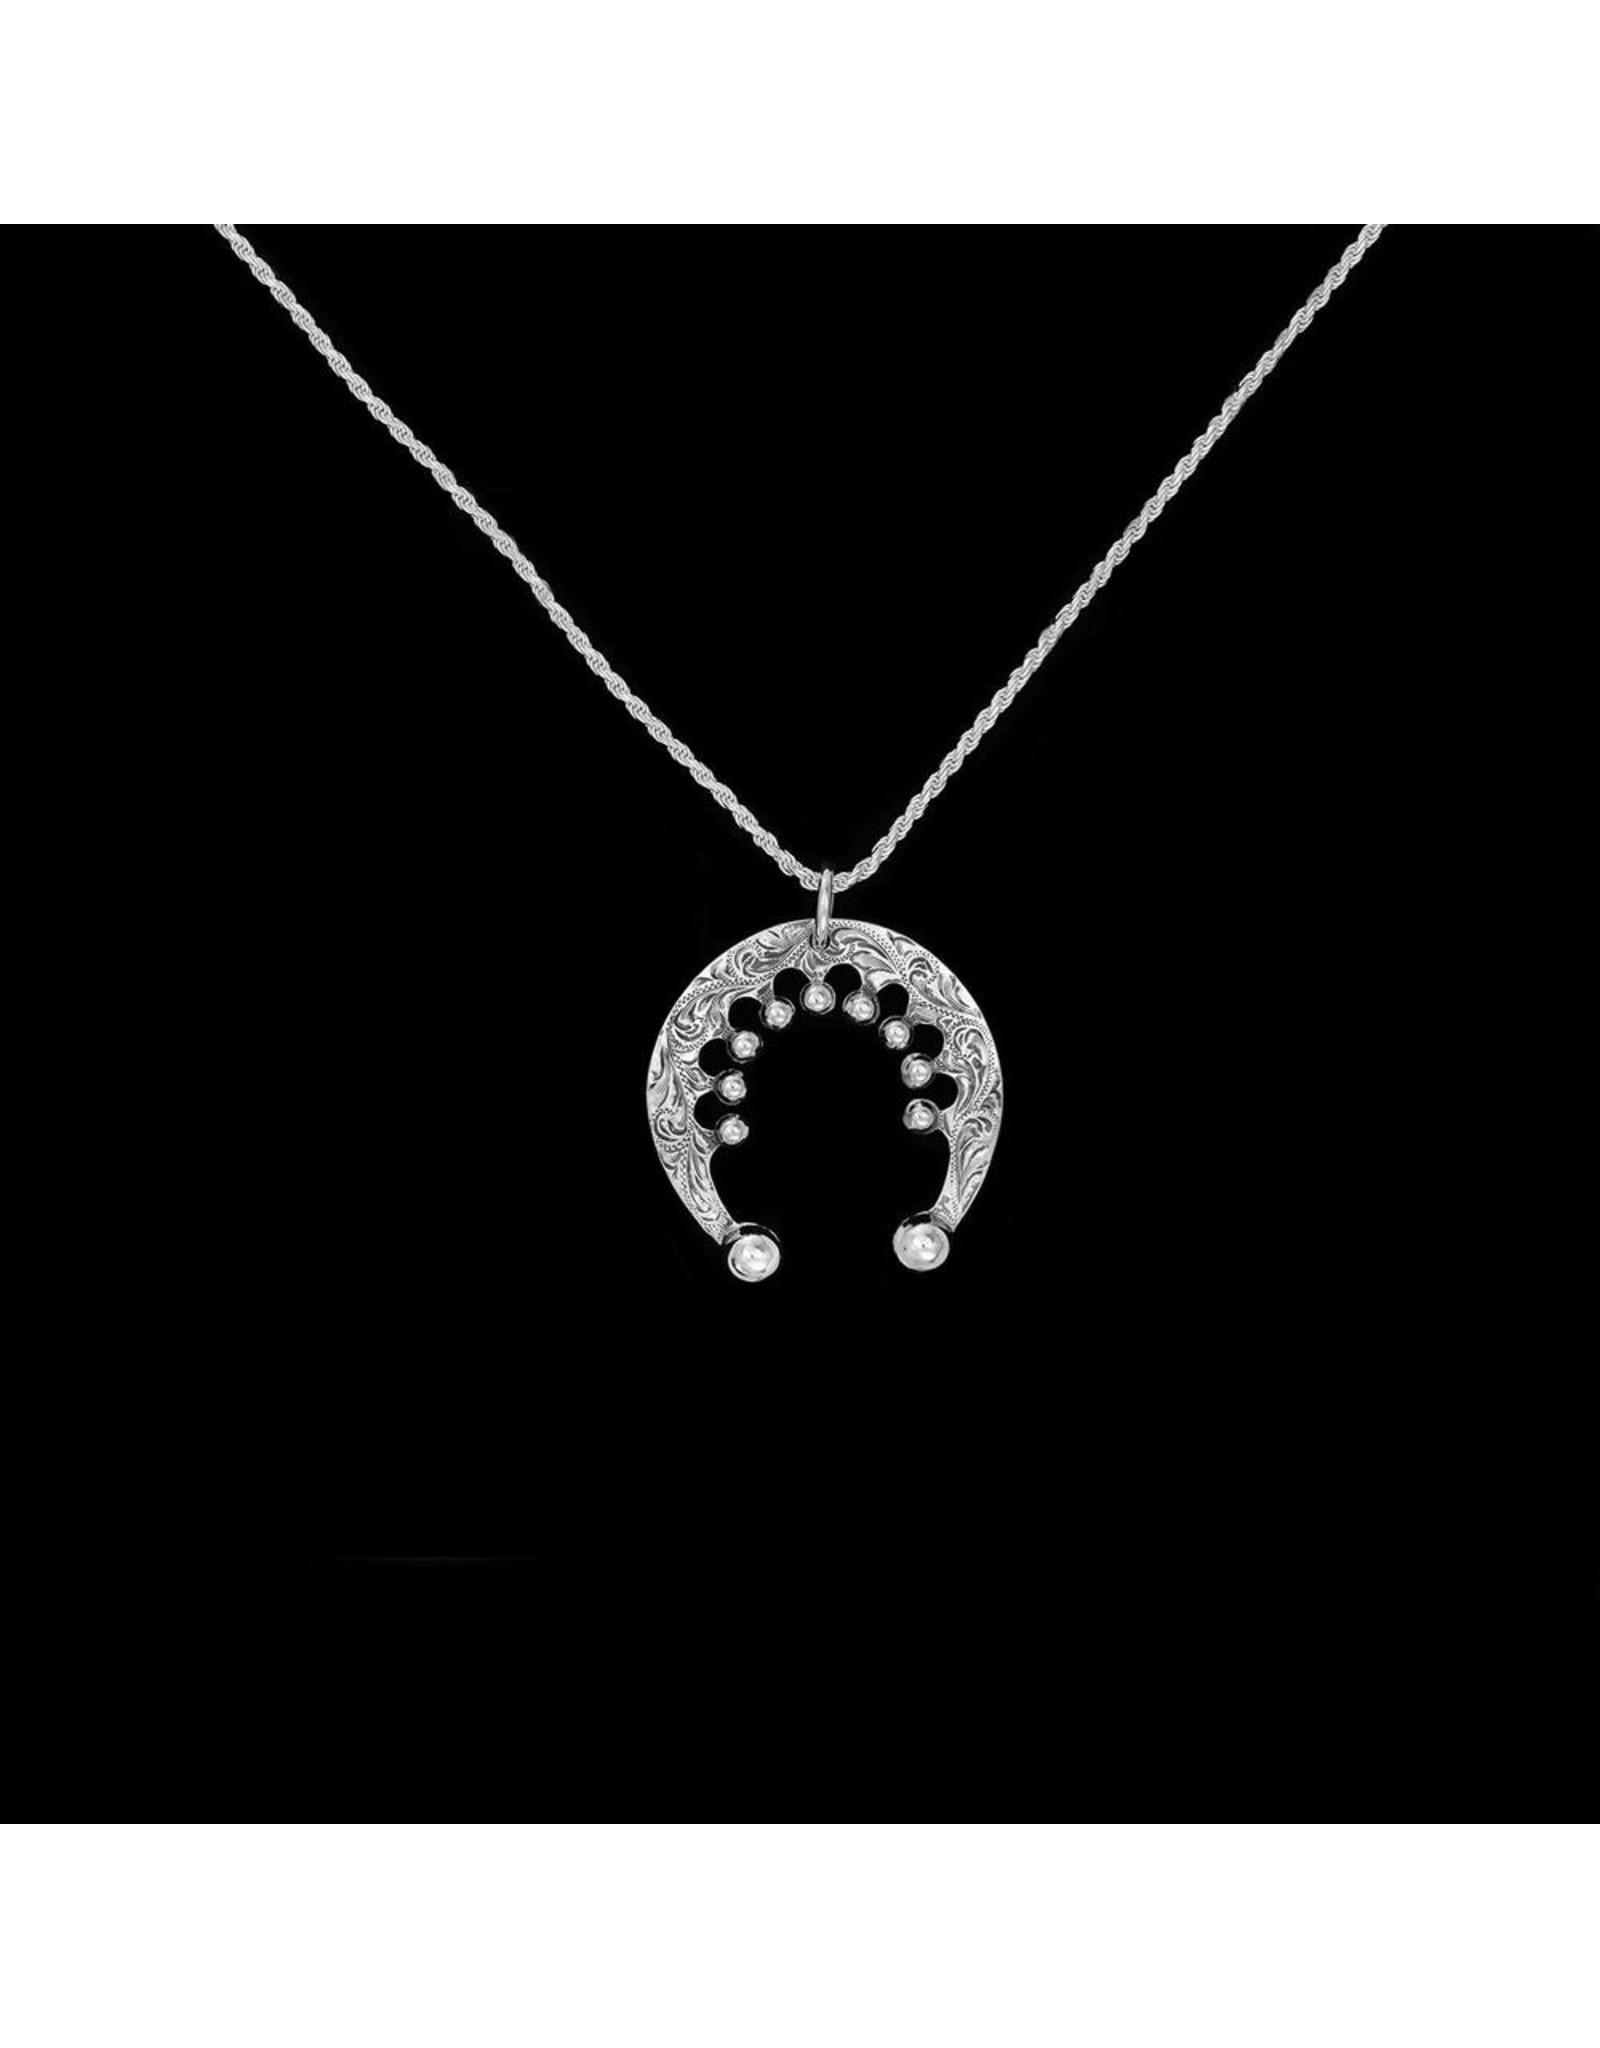 Half Moon Pendant w/ center beads